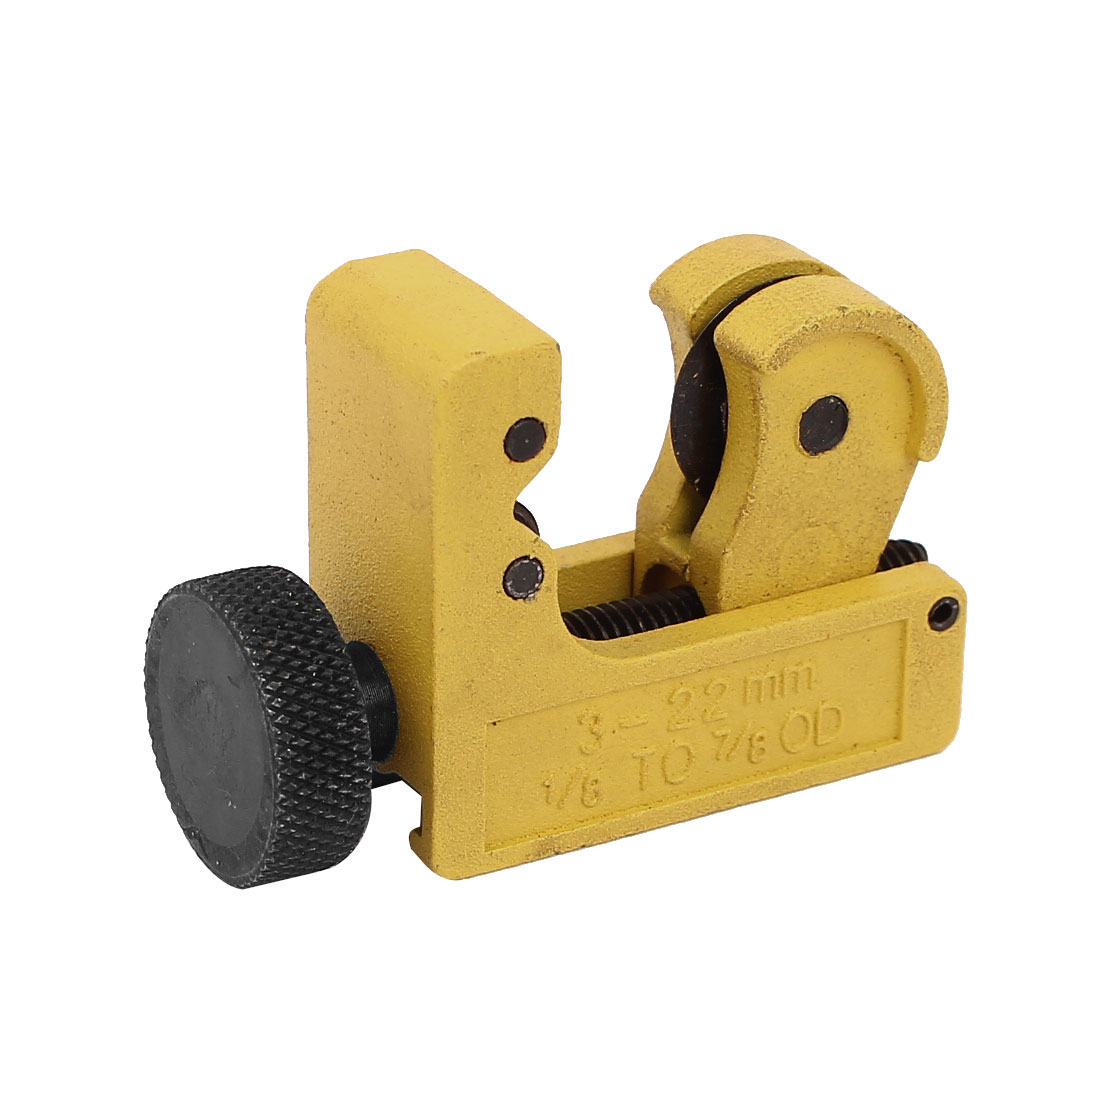 "Mini Yellow 1/8"" to 7/8"" Outside Dia Copper Iron Pipe Tube Cutter Tool"